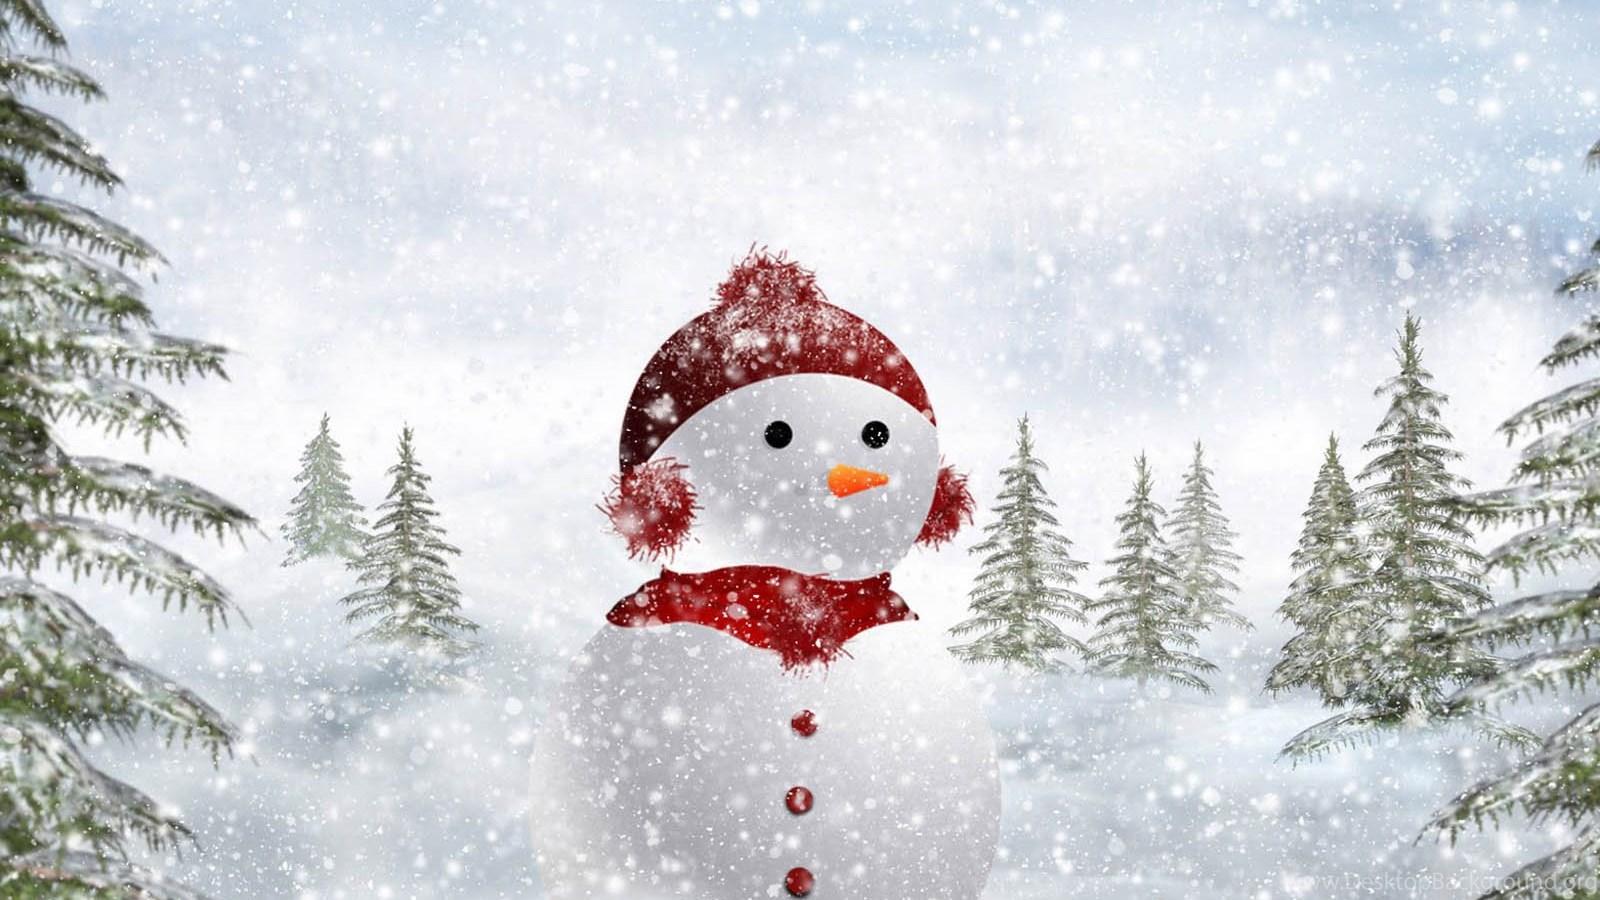 Wallpaper Snowman Wallpapers Desktop Background